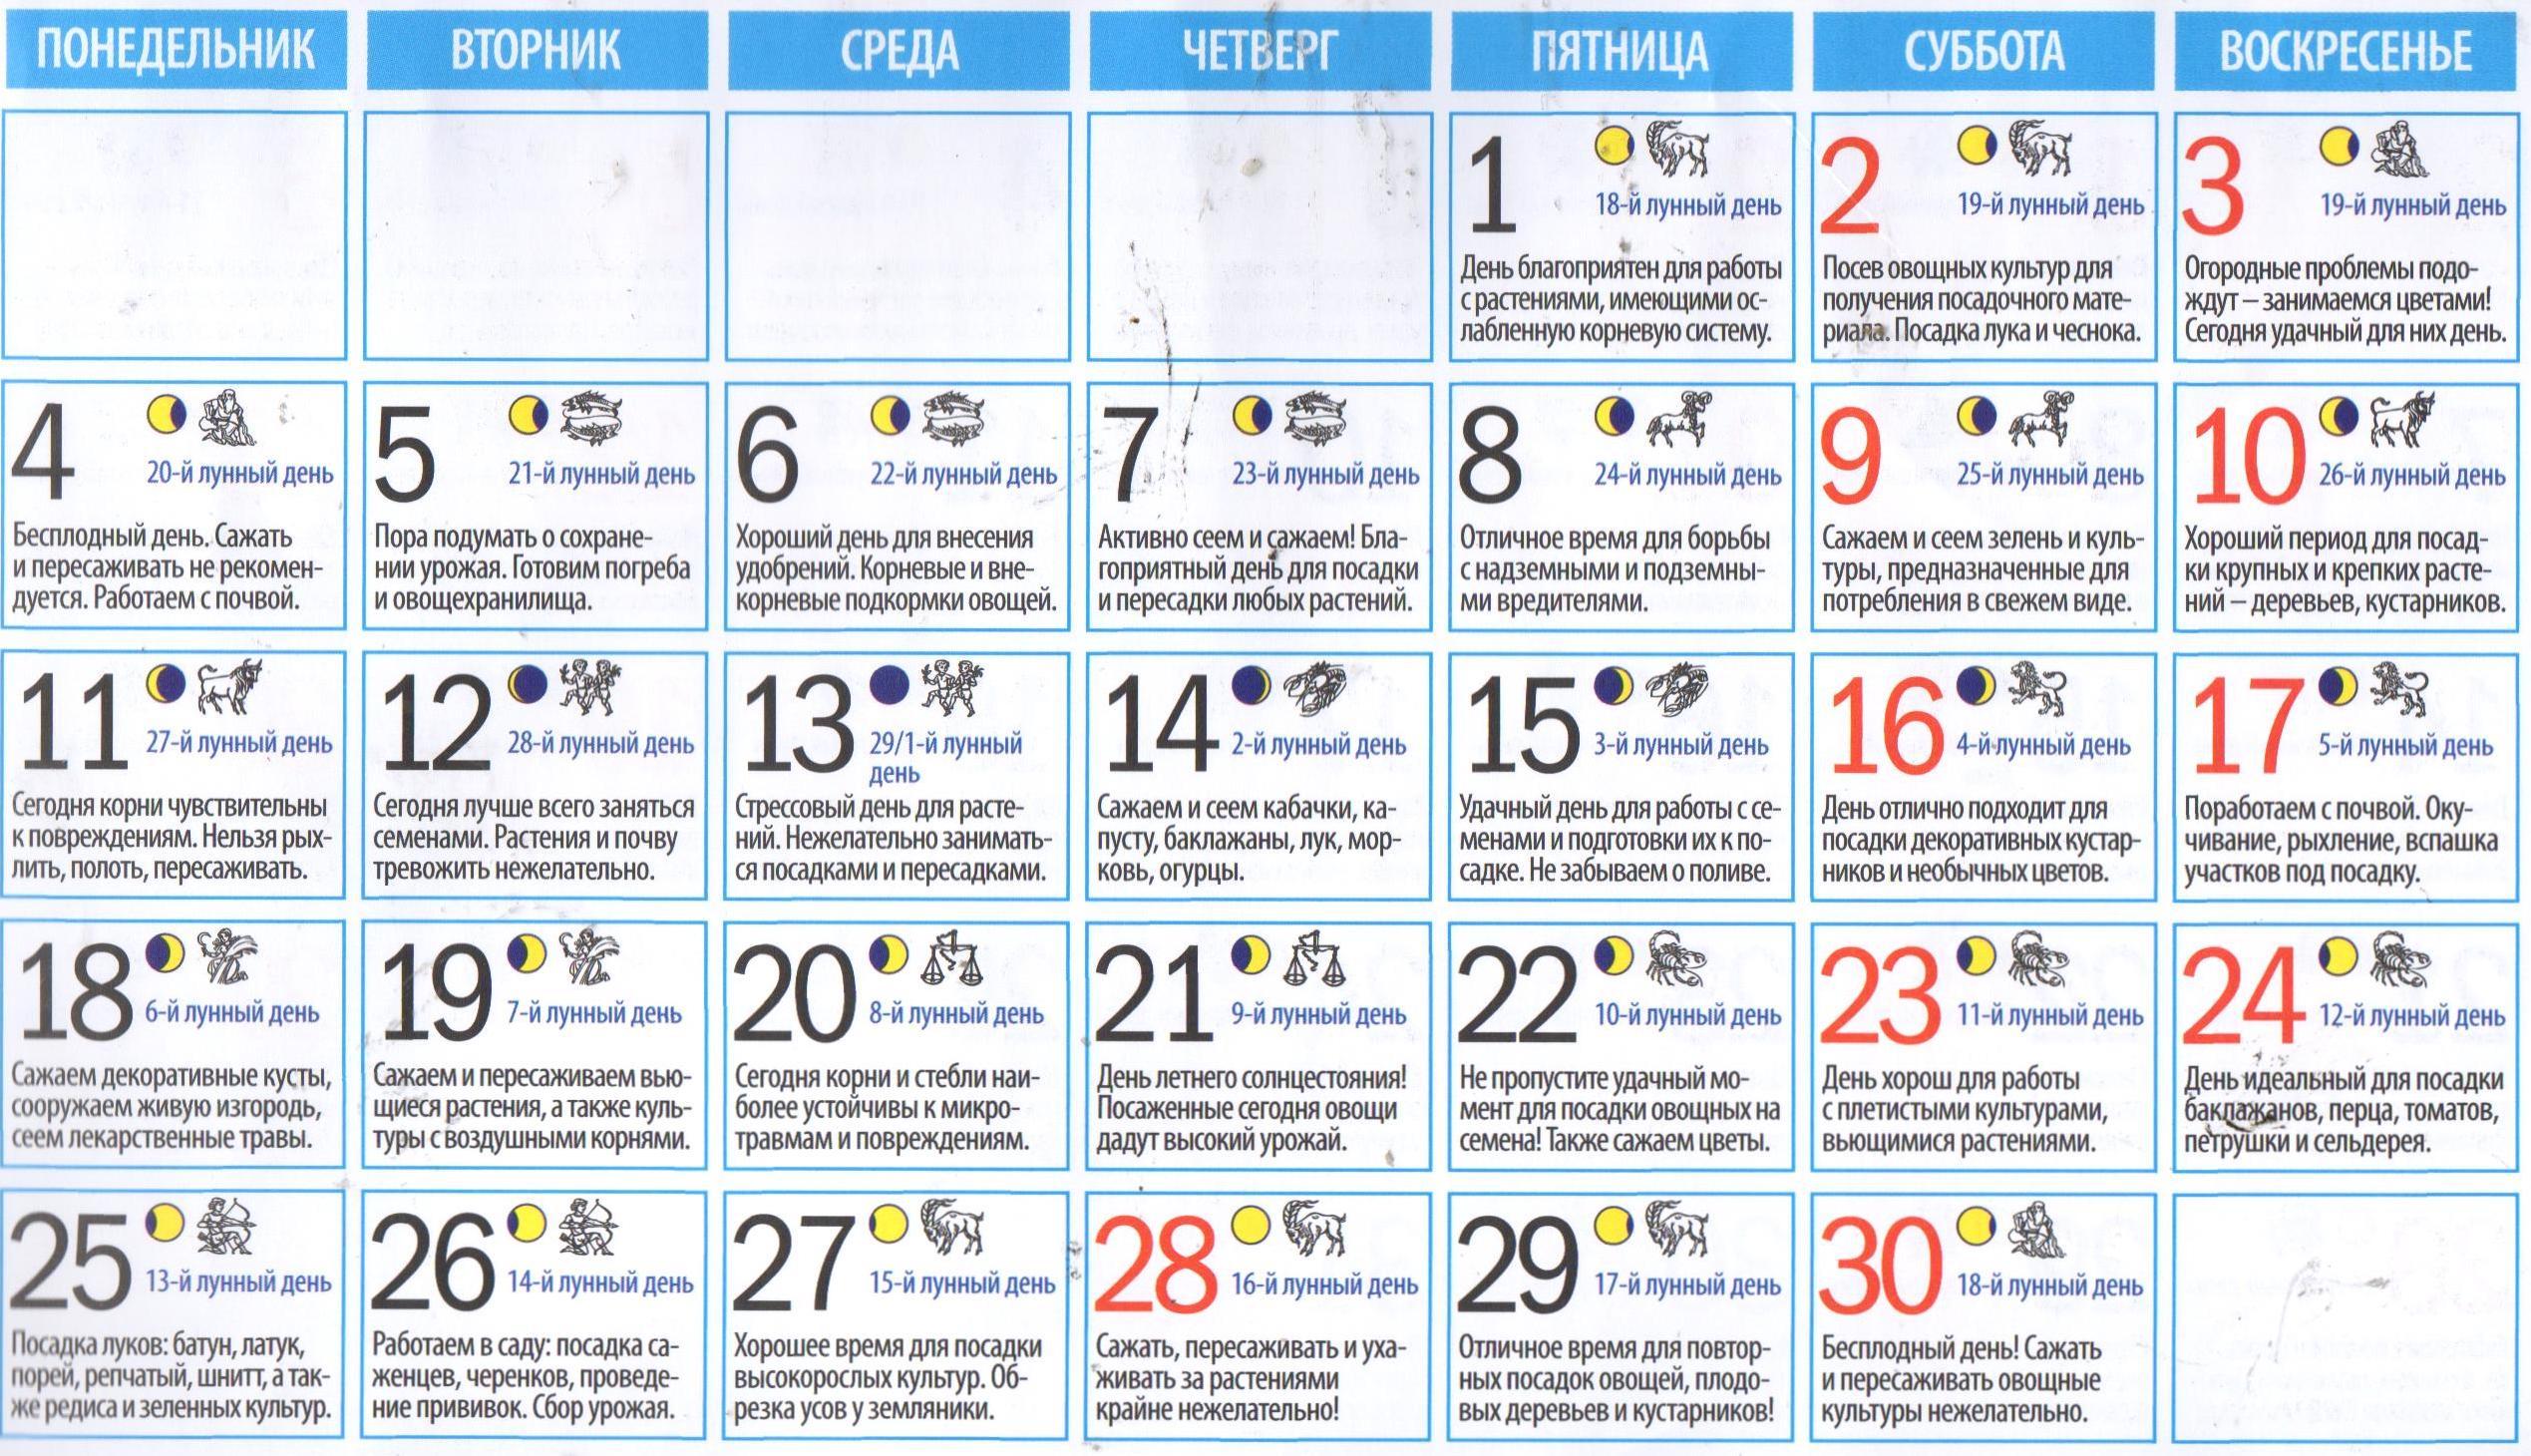 Удачное Знакомство По Лунному Календарю